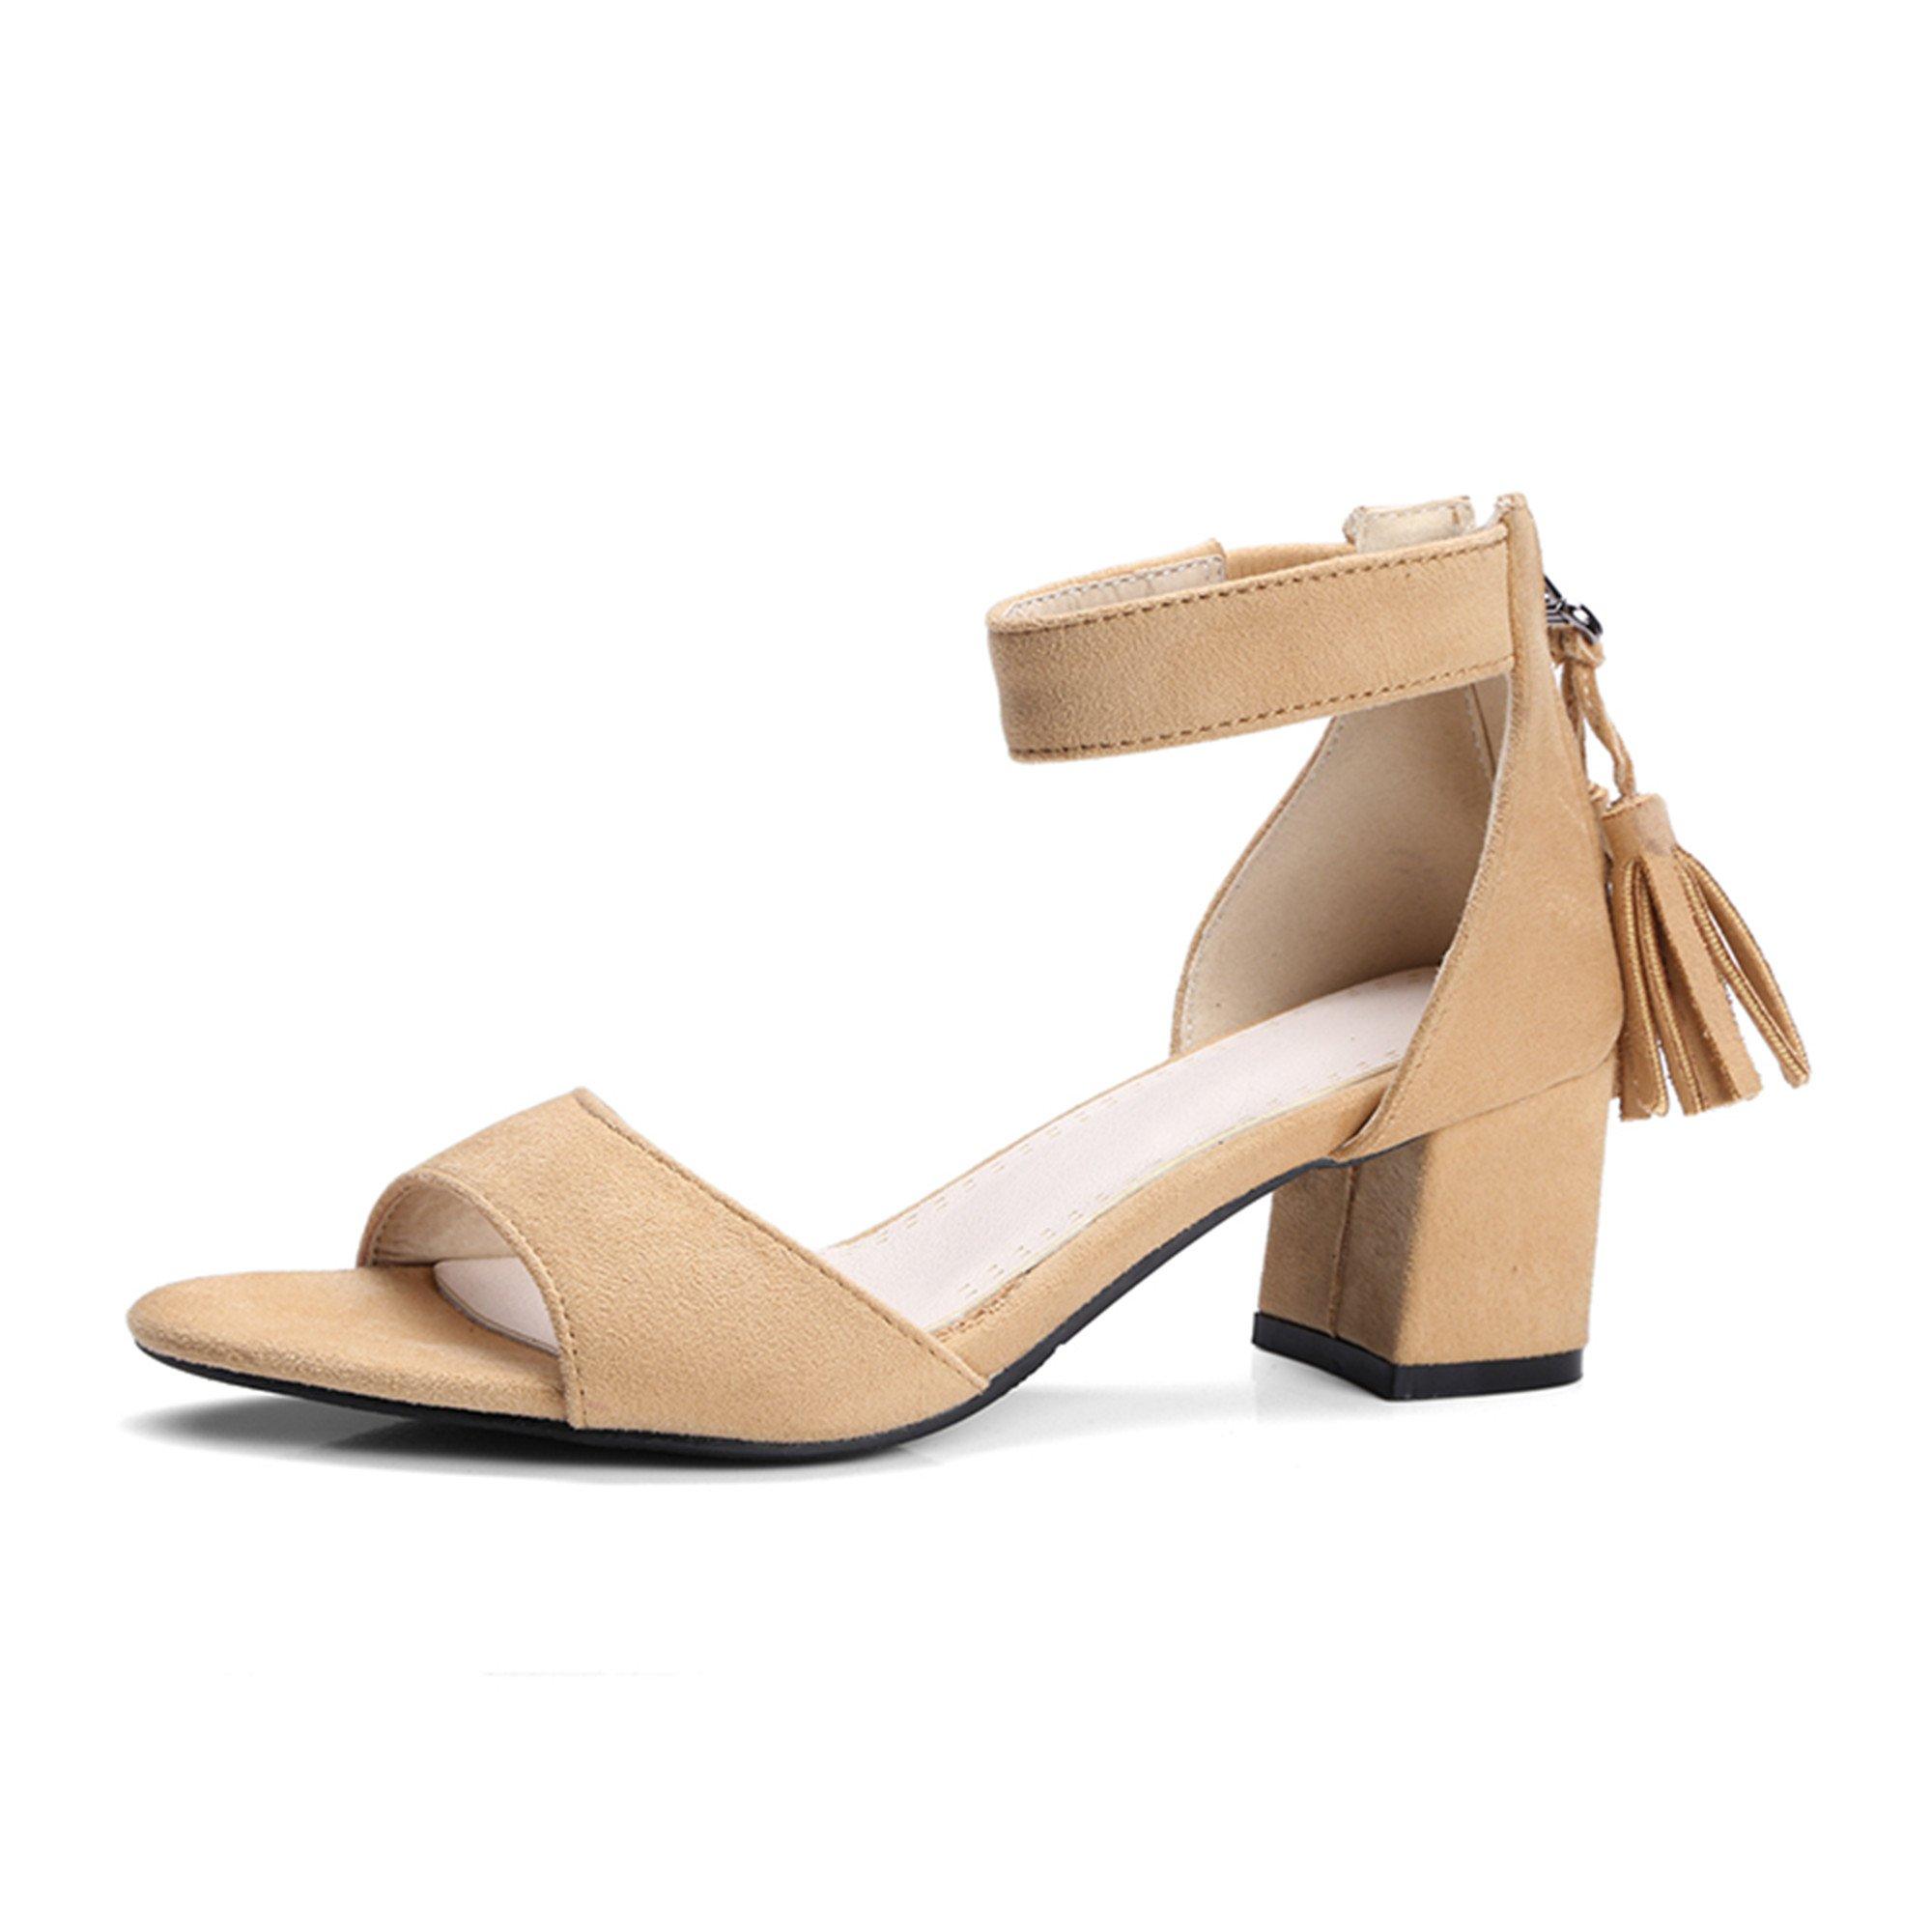 Yaheeda Elastic Ankle Strap Kitten Heel-Strappy Block Heel-Cute Low Sandal-Faux Leather Vegan